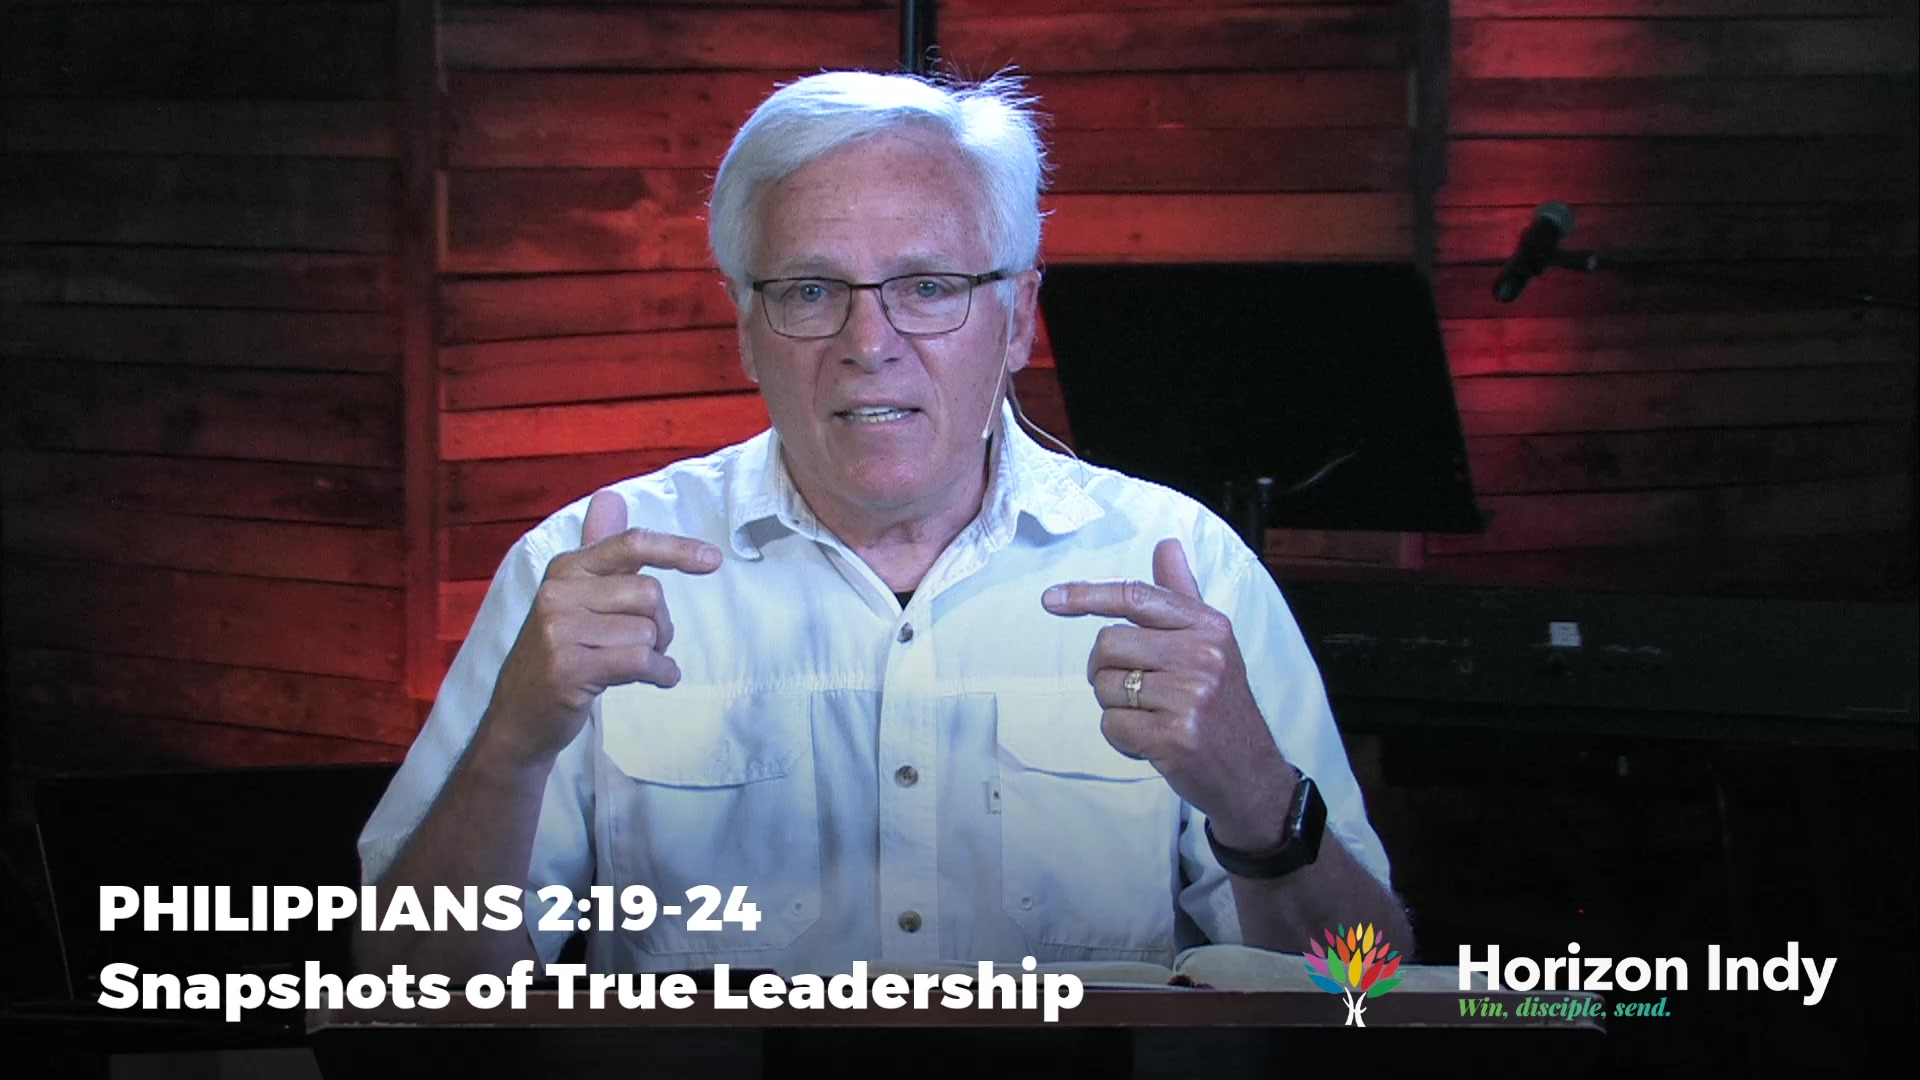 Snapshots of True Leadership